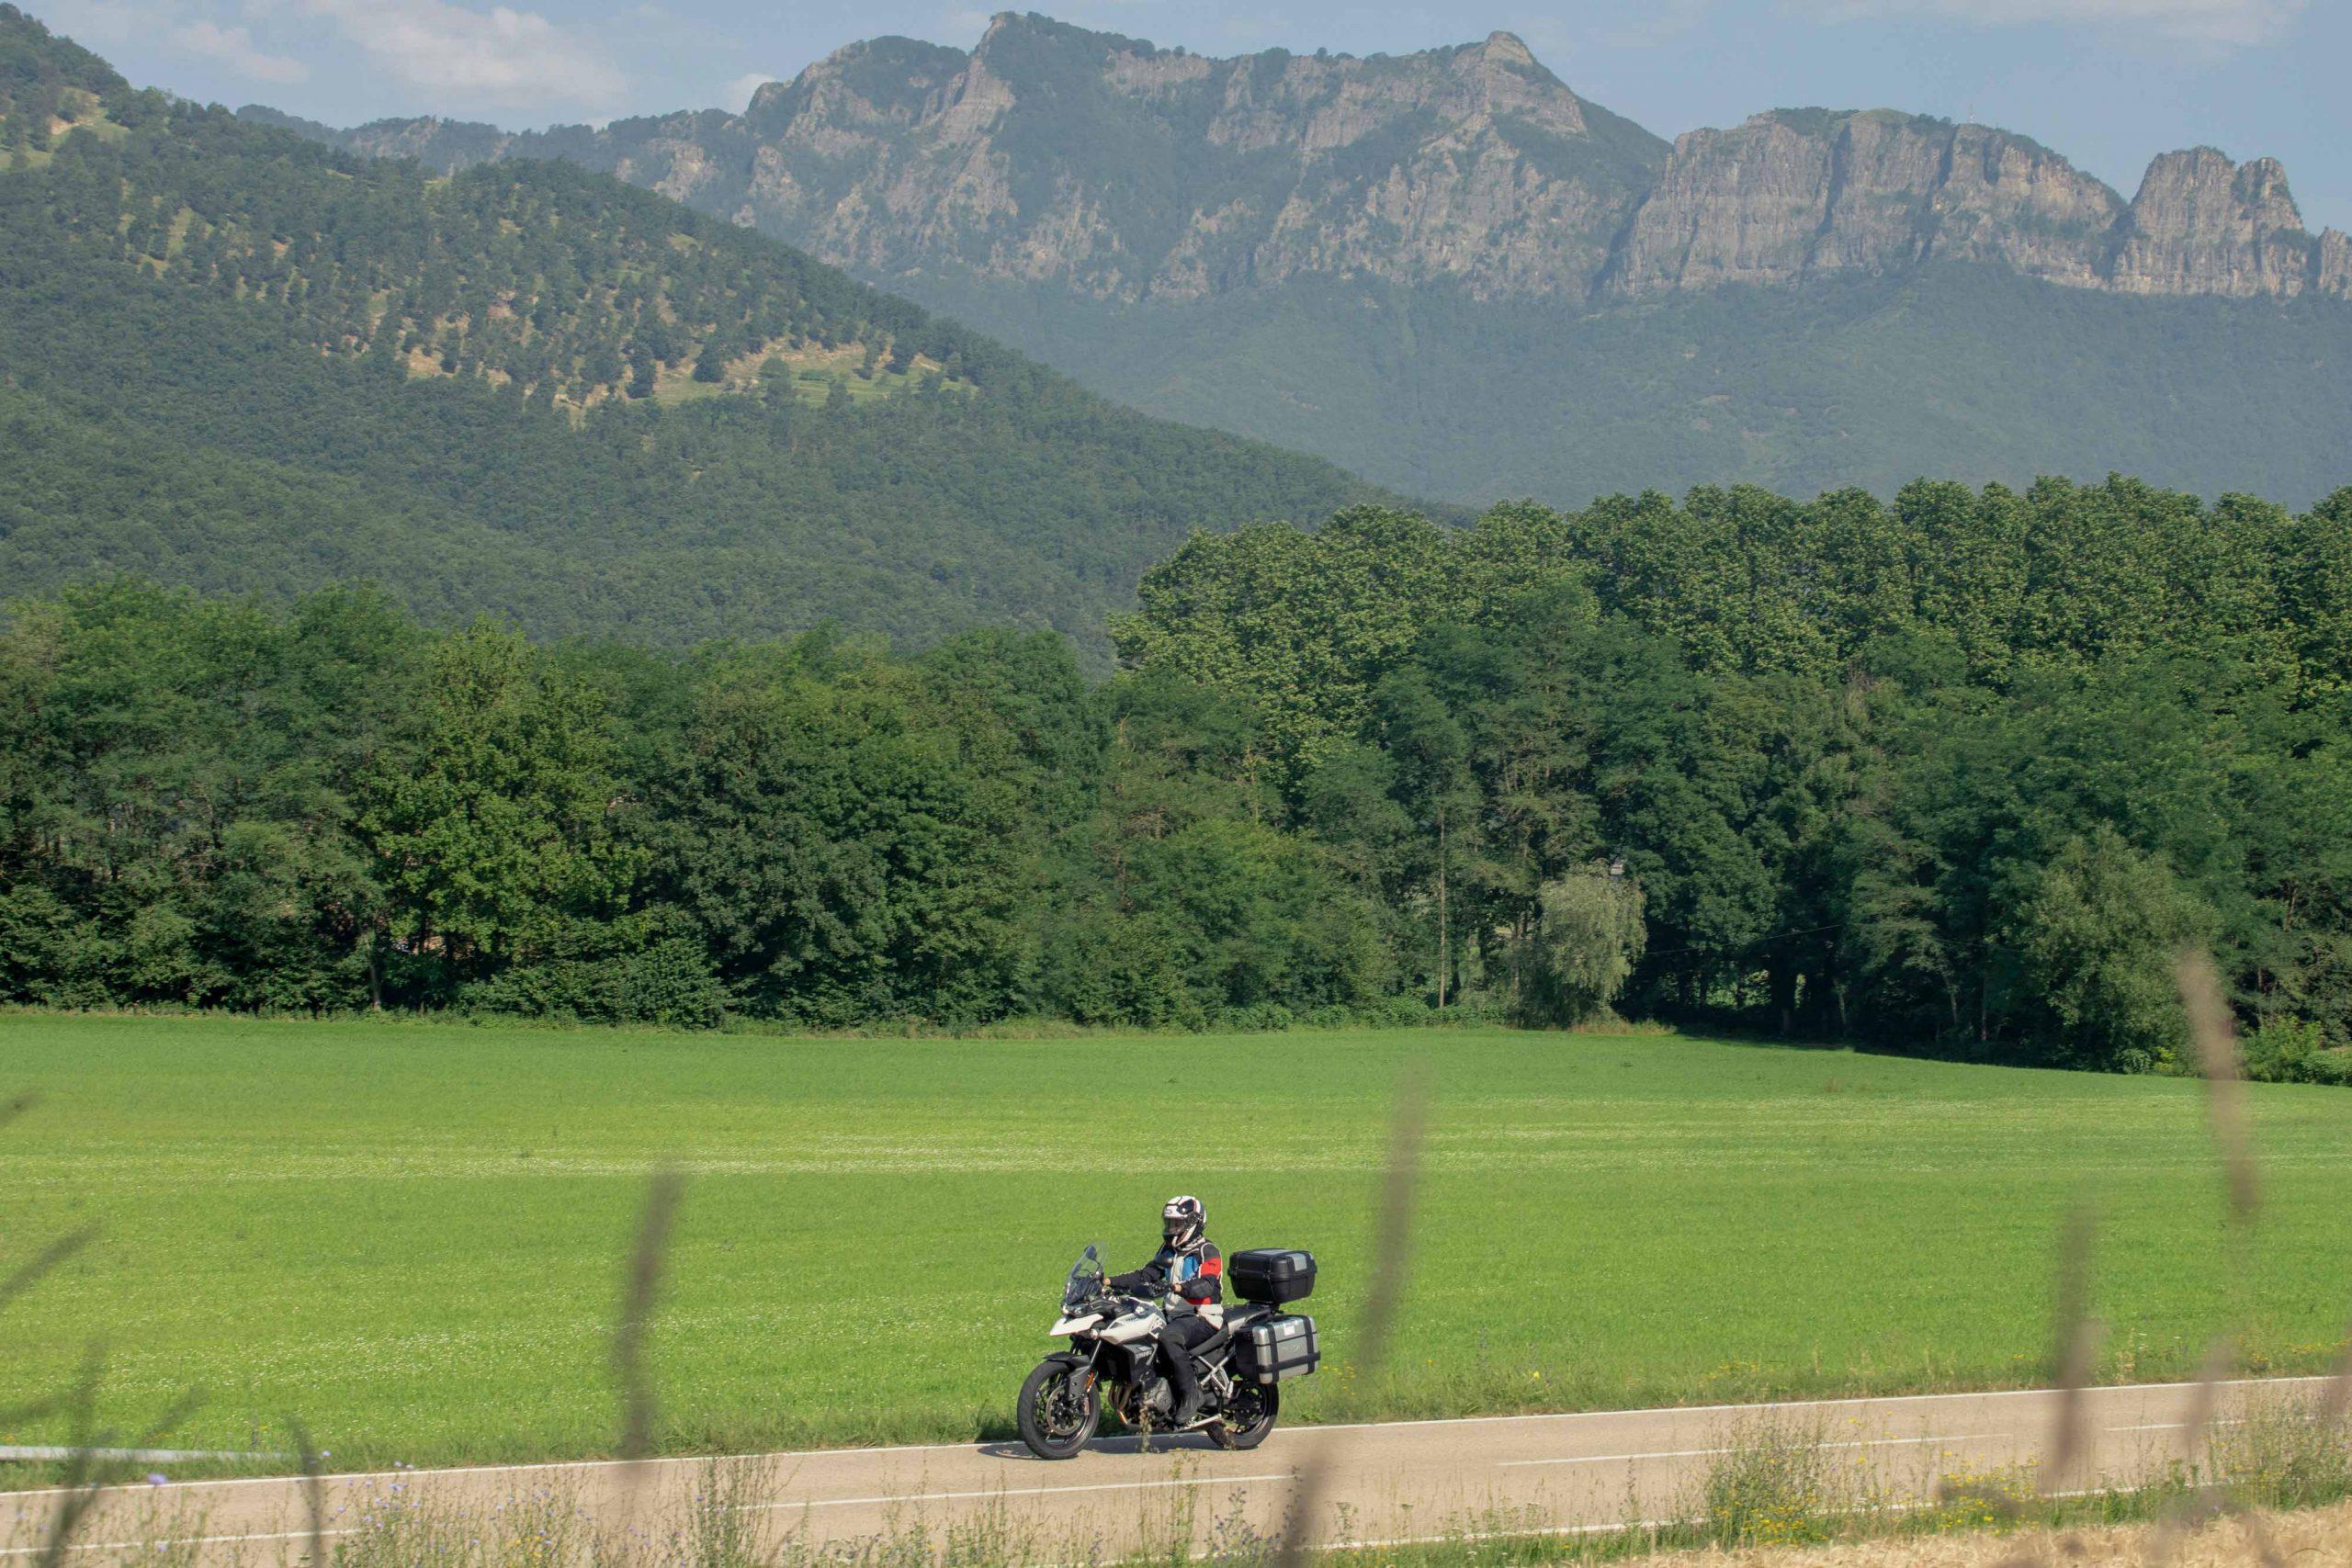 004_TriumphTiger-motosnet-mariapujol-fotografobarcelona